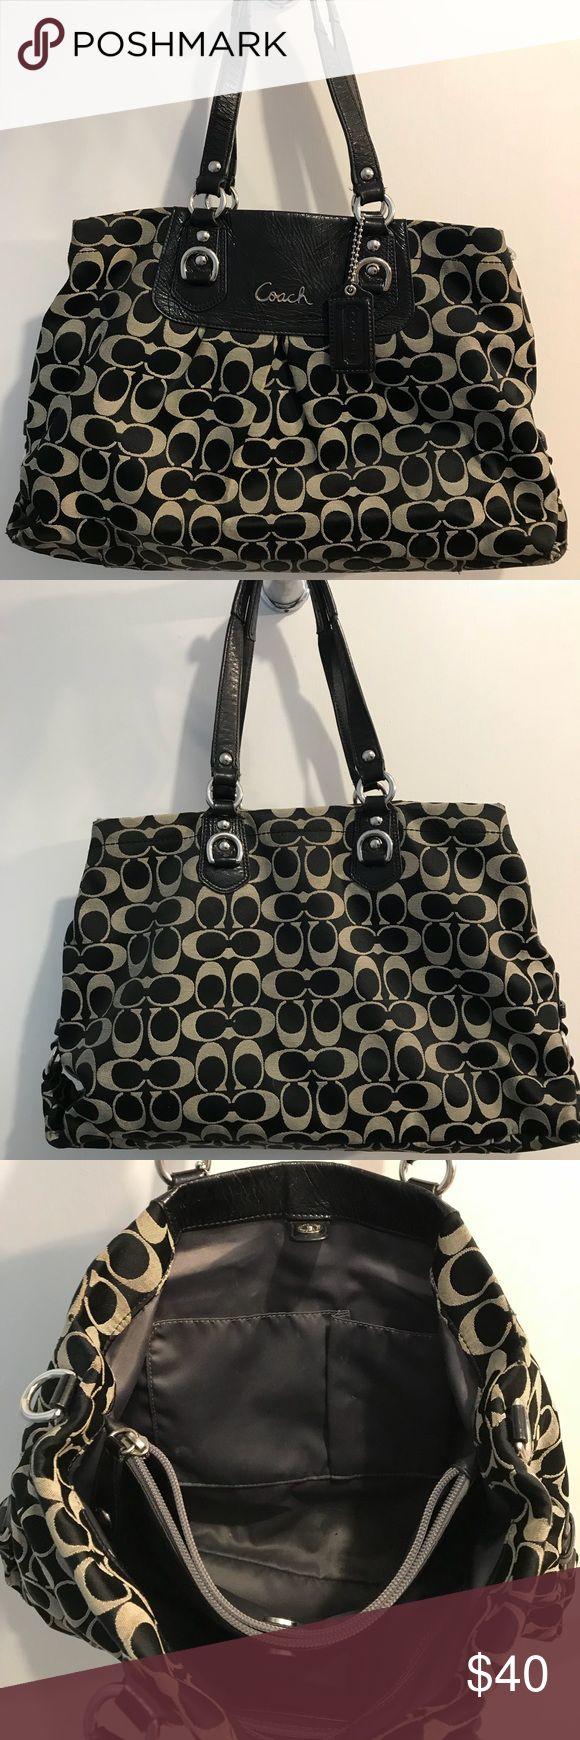 Coach Purse Cute black Coach purse in good condition. Coach Bags Shoulder Bags